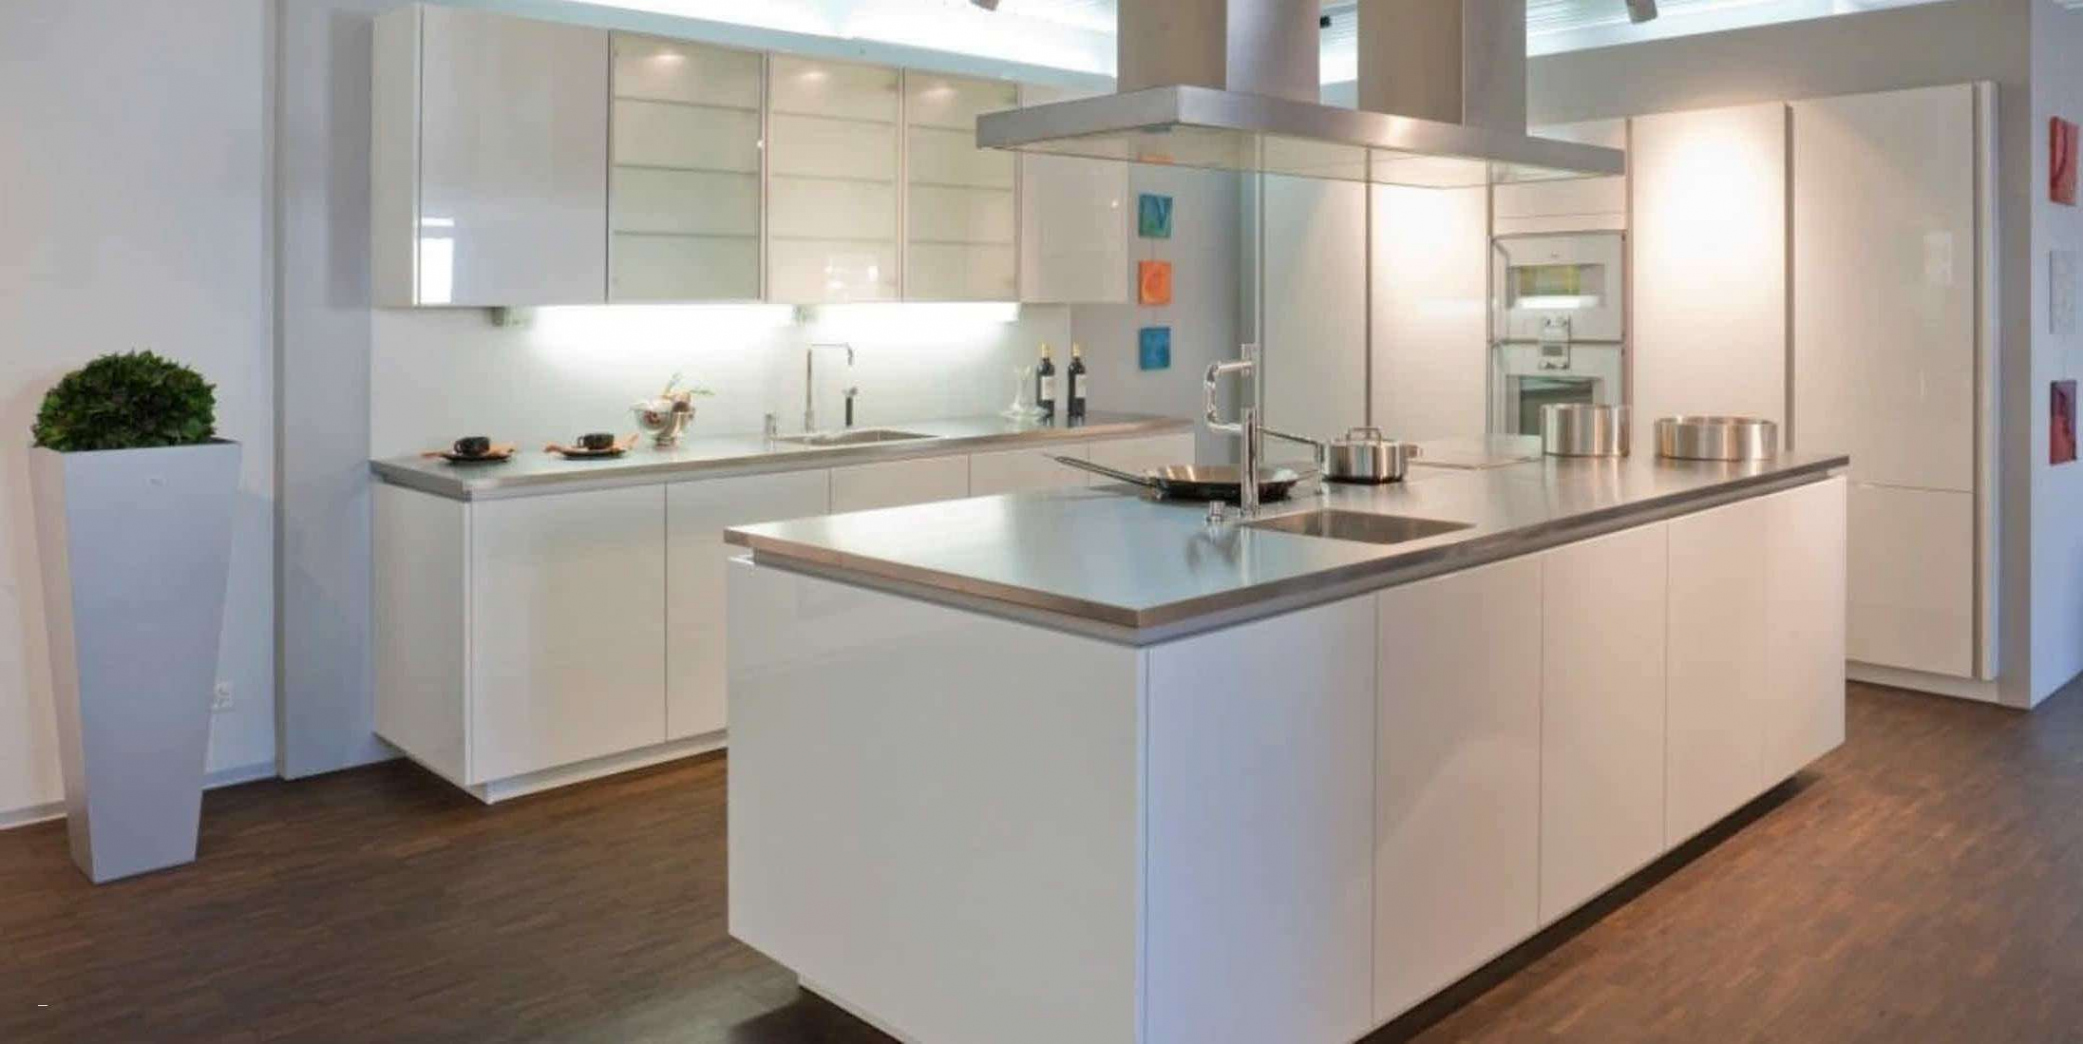 45 luxus deko ideen kuche galerie kuchen fur dachgeschosswohnungen kuchen fur dachgeschosswohnungen